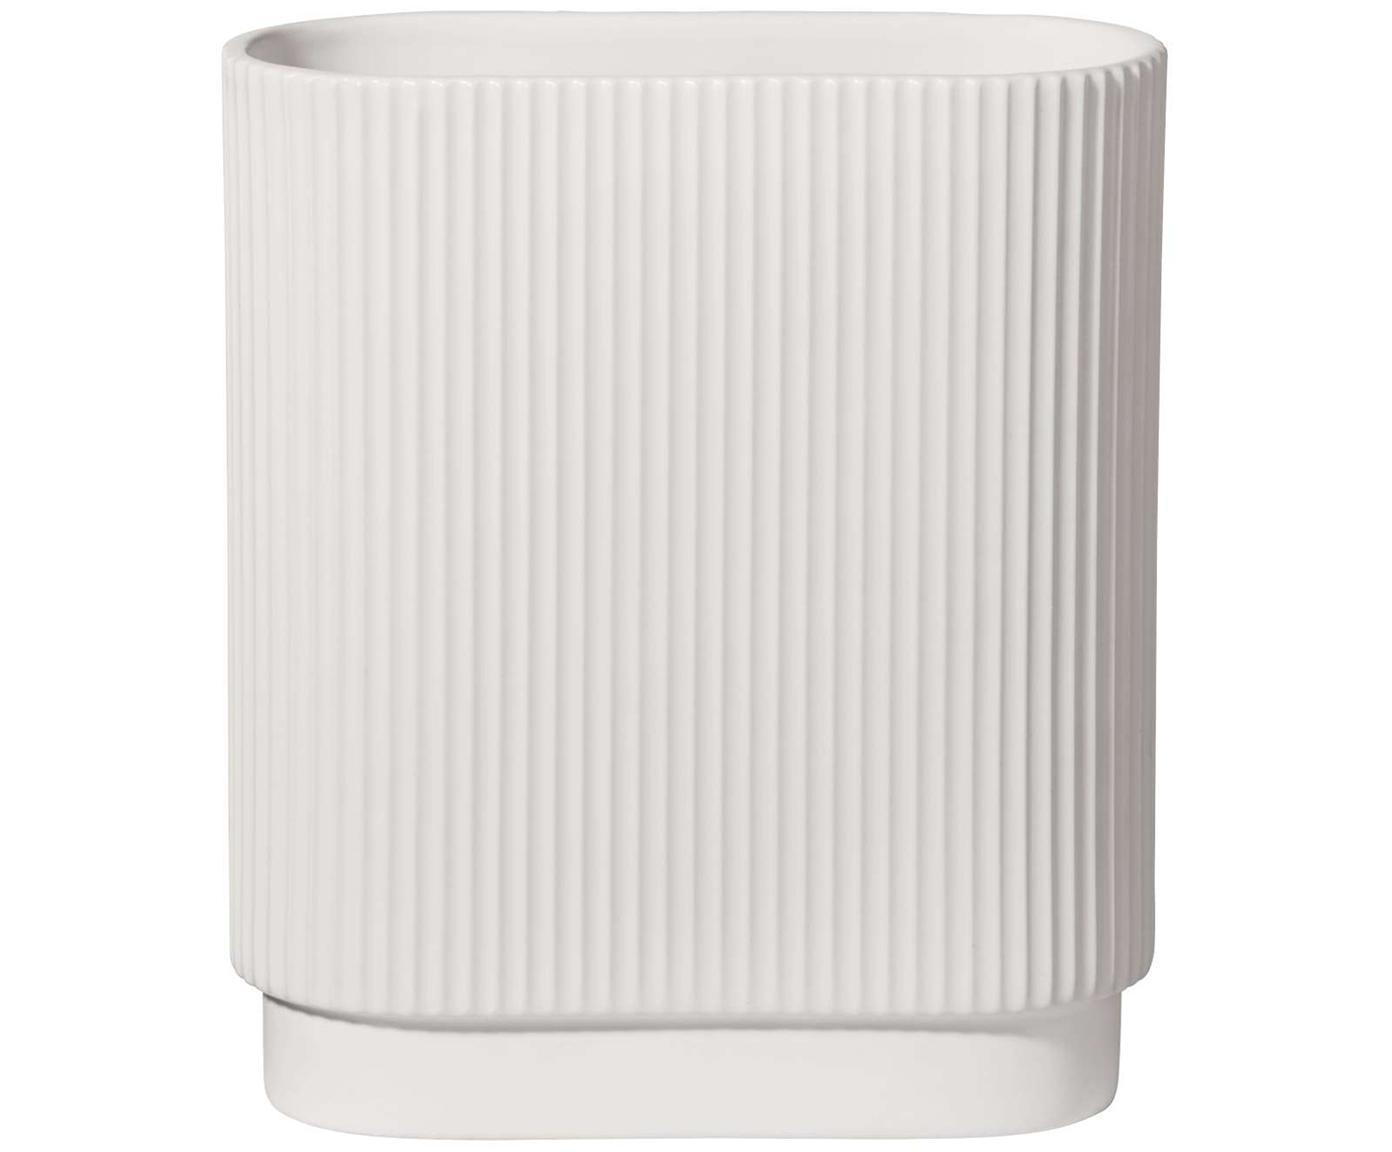 Grosse Vase Art Deco aus Porzellan, Porzellan, Weiss, 17 x 20 cm